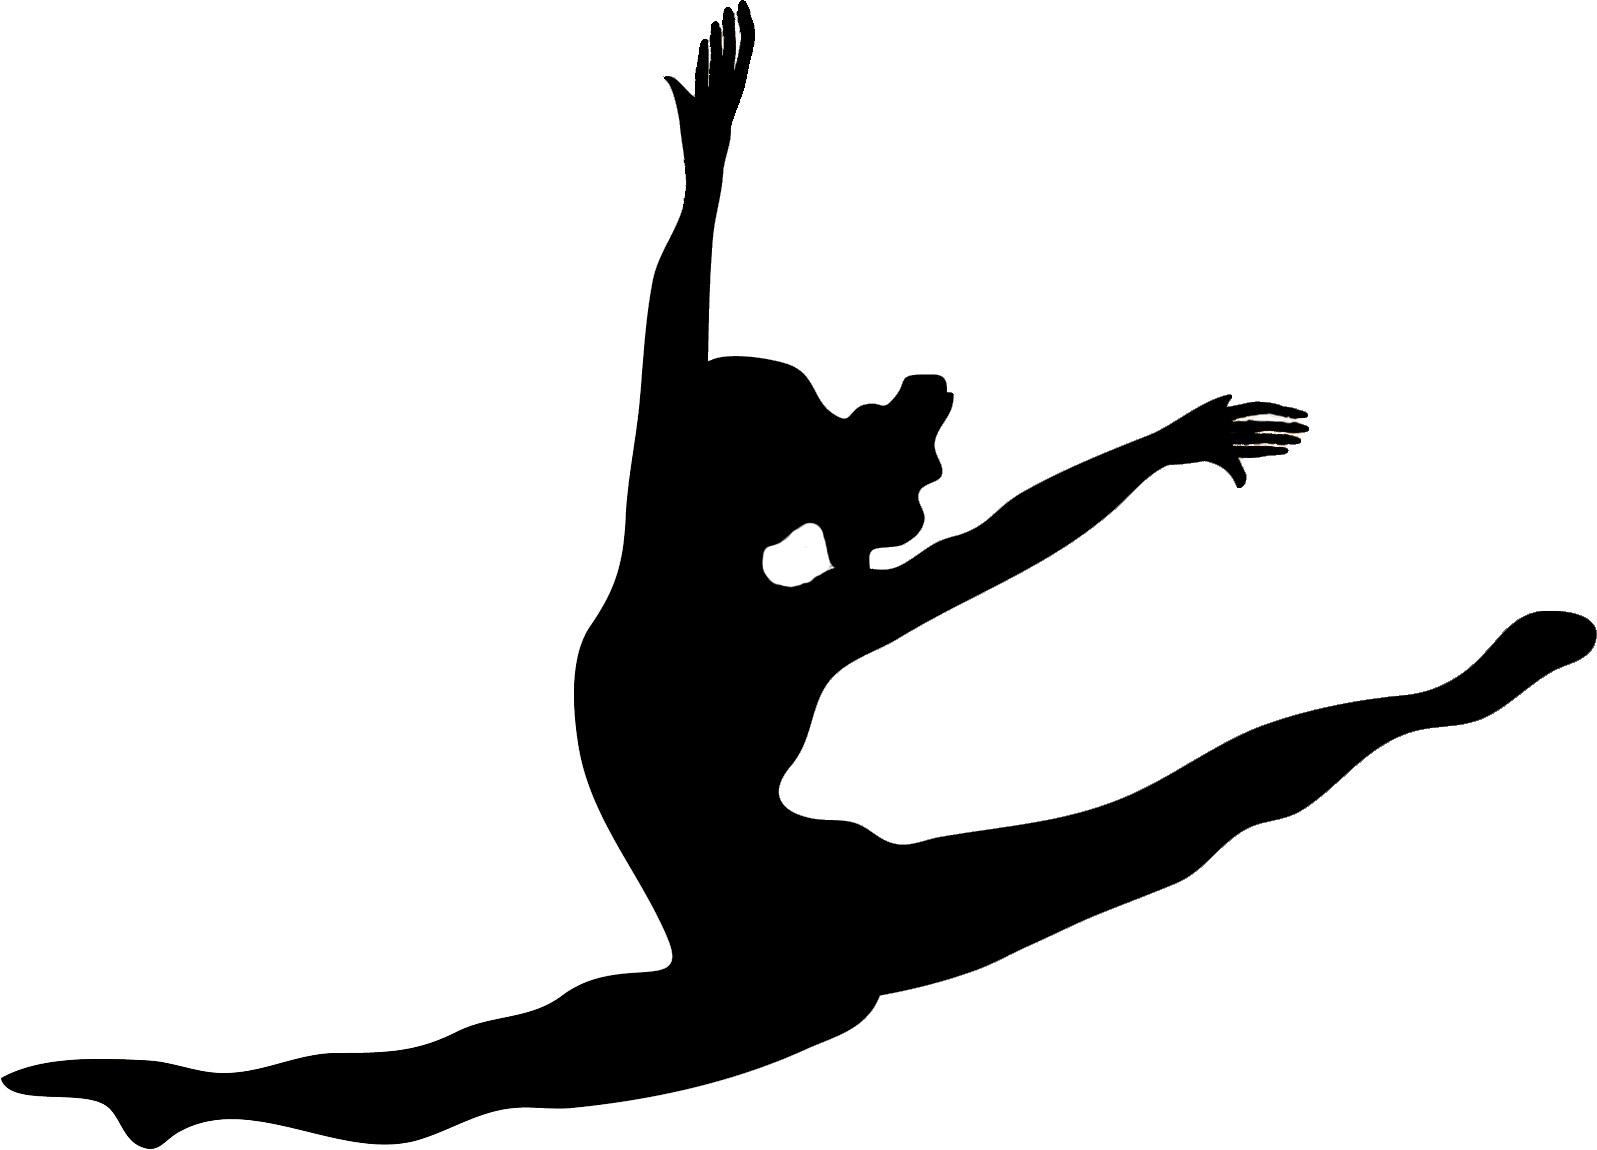 1597x1150 Dance Silhouette Images Free Download Clip Art Free Clip Art